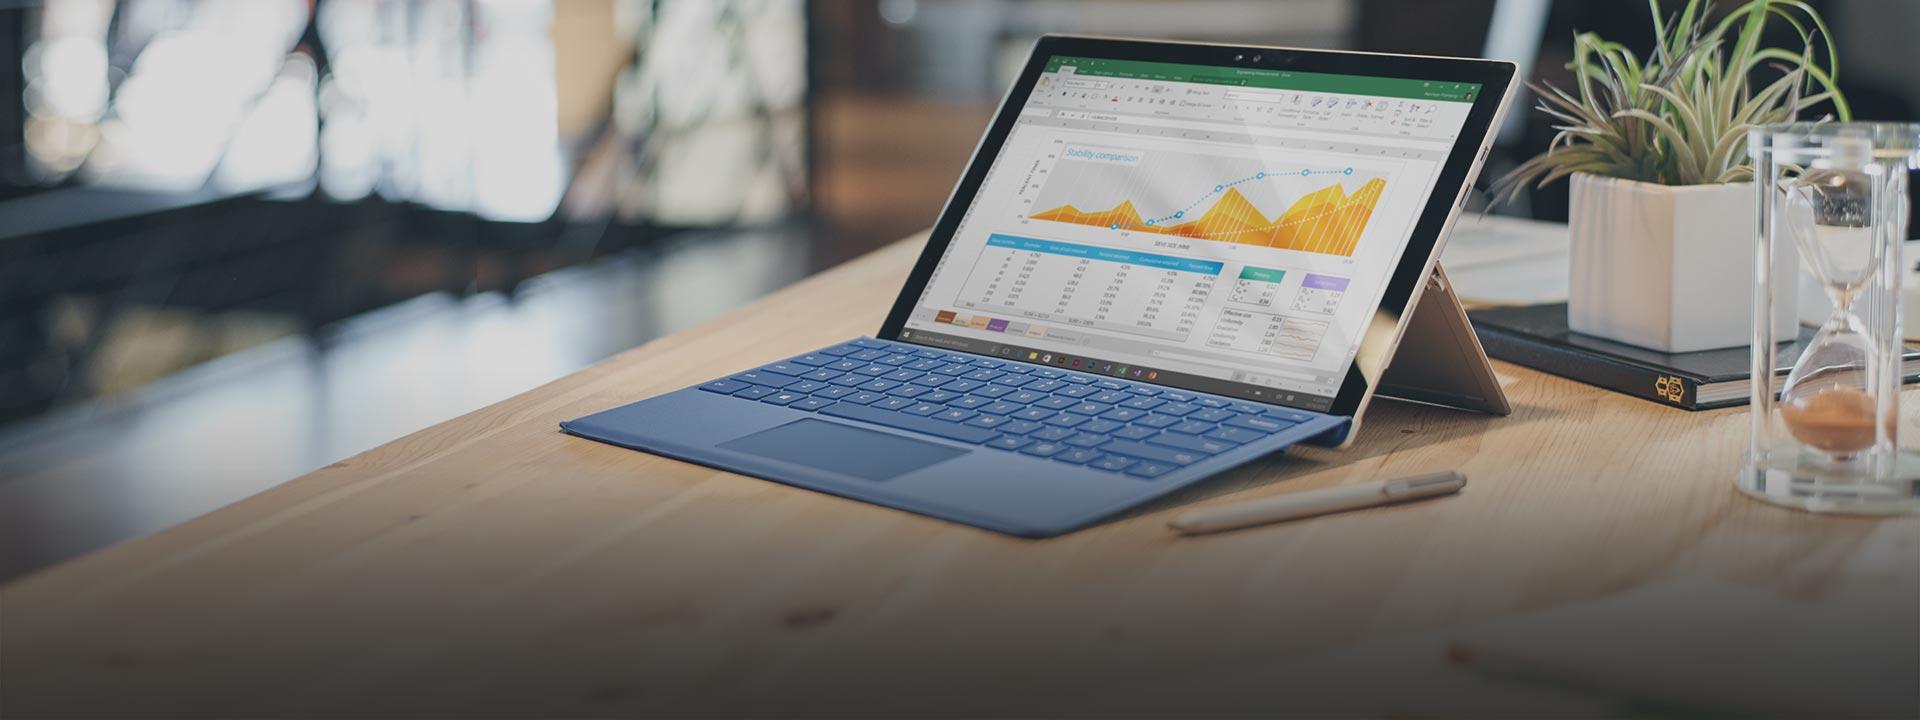 Surface Pro 4, saiba mais